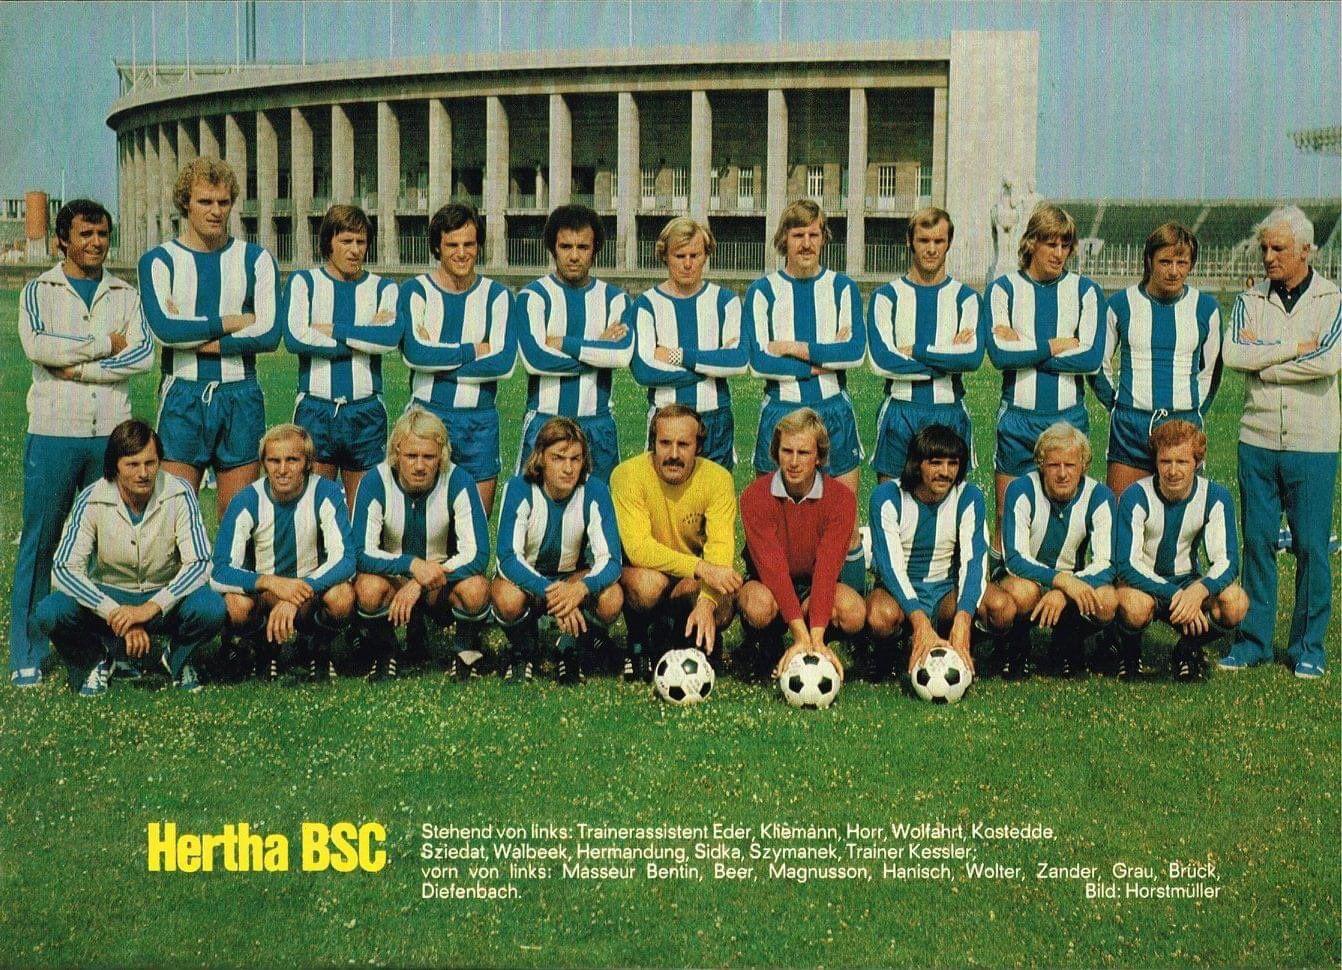 Hertha Bsc Г¶stersund